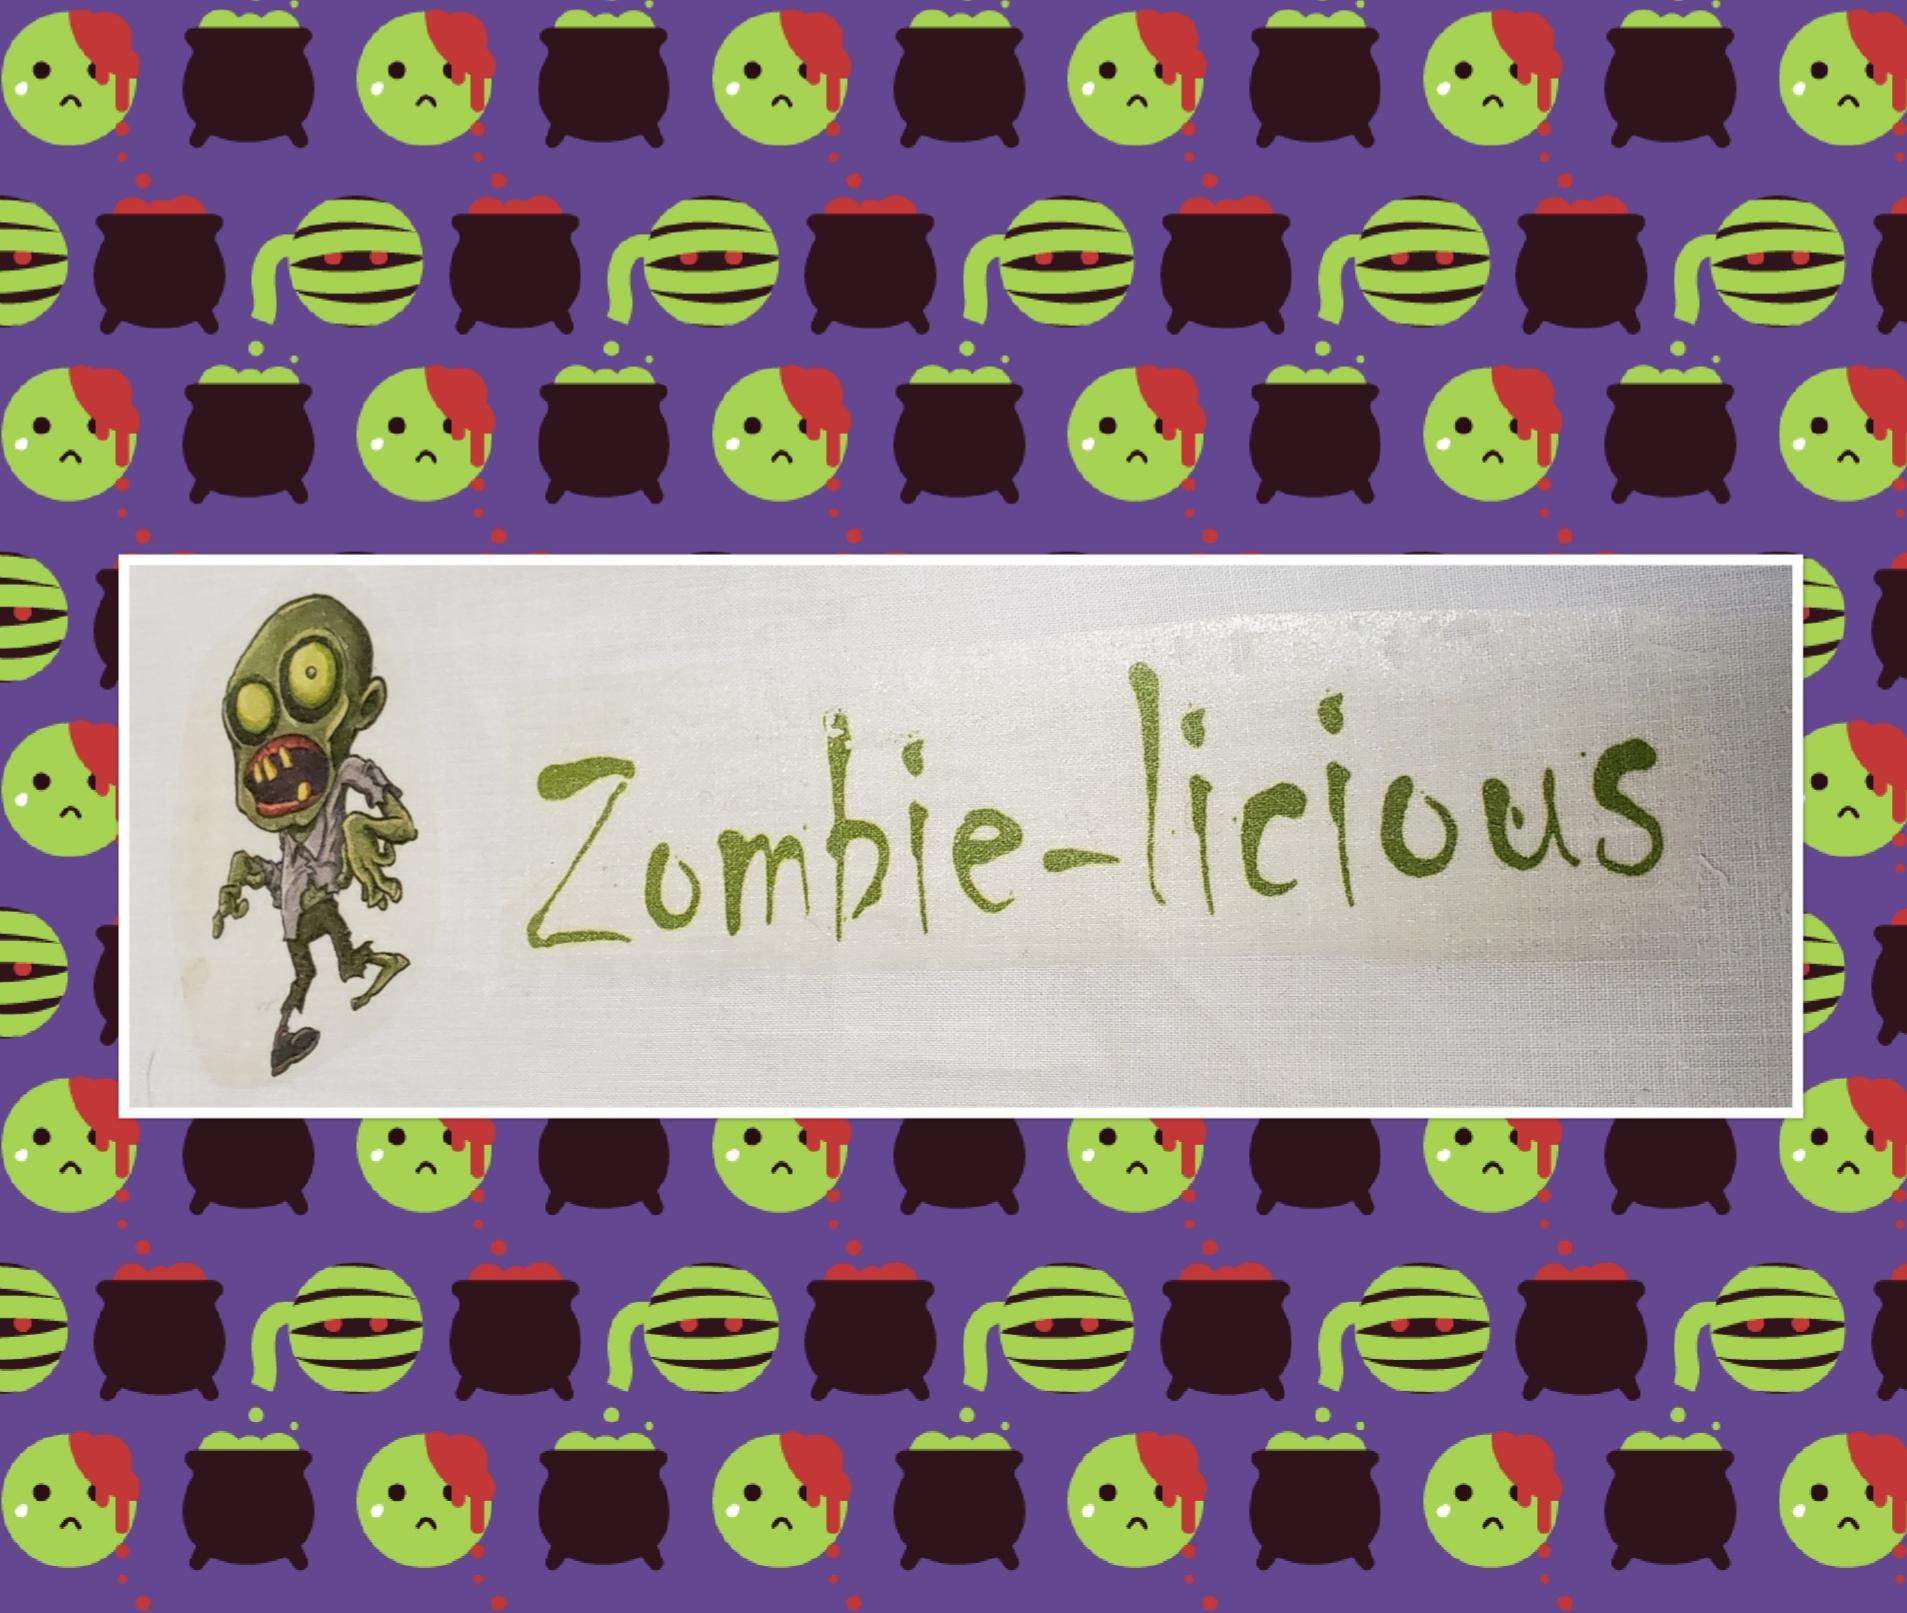 Zombie-licious photo